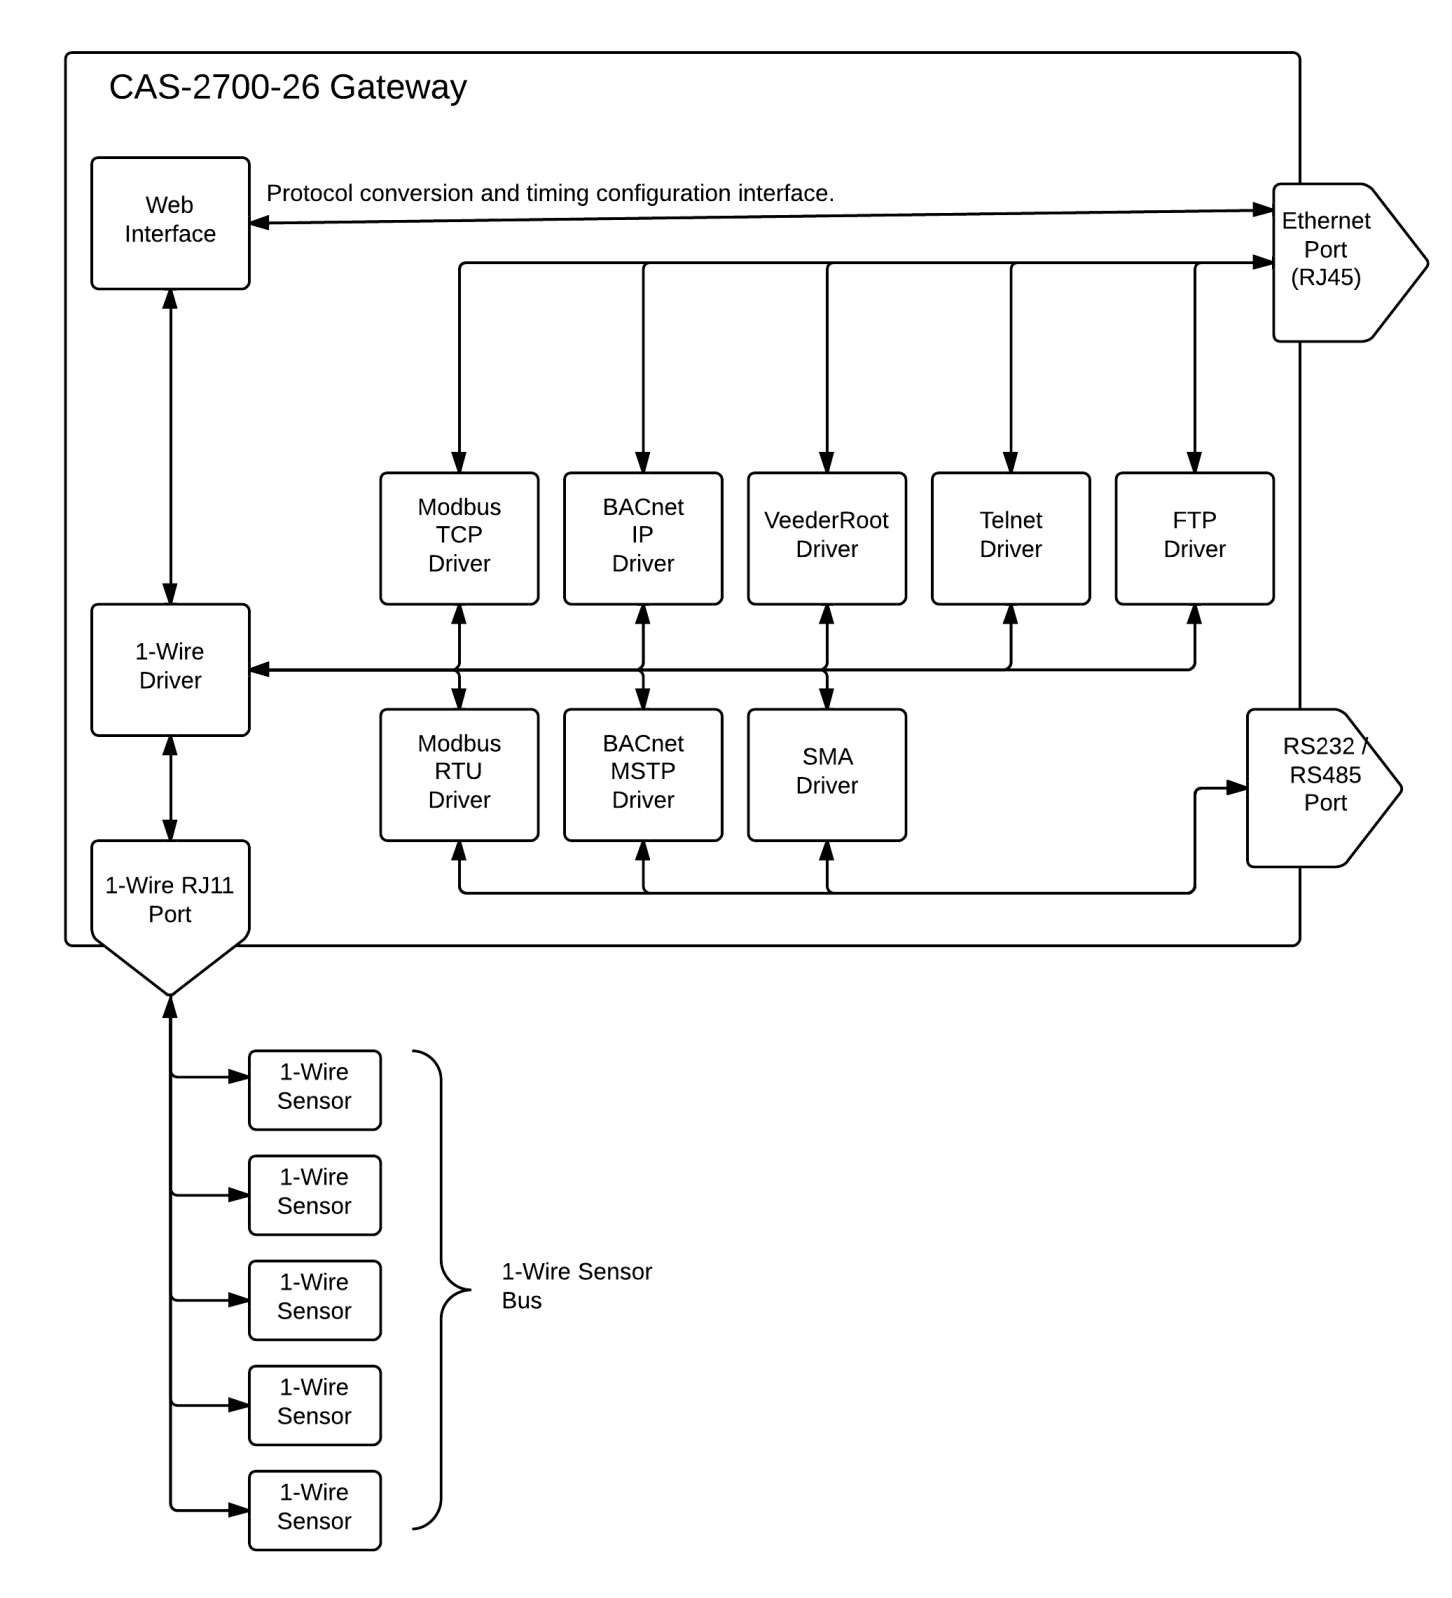 bacnet ms tp wiring diagram 1 exclusive hookah de \u2022